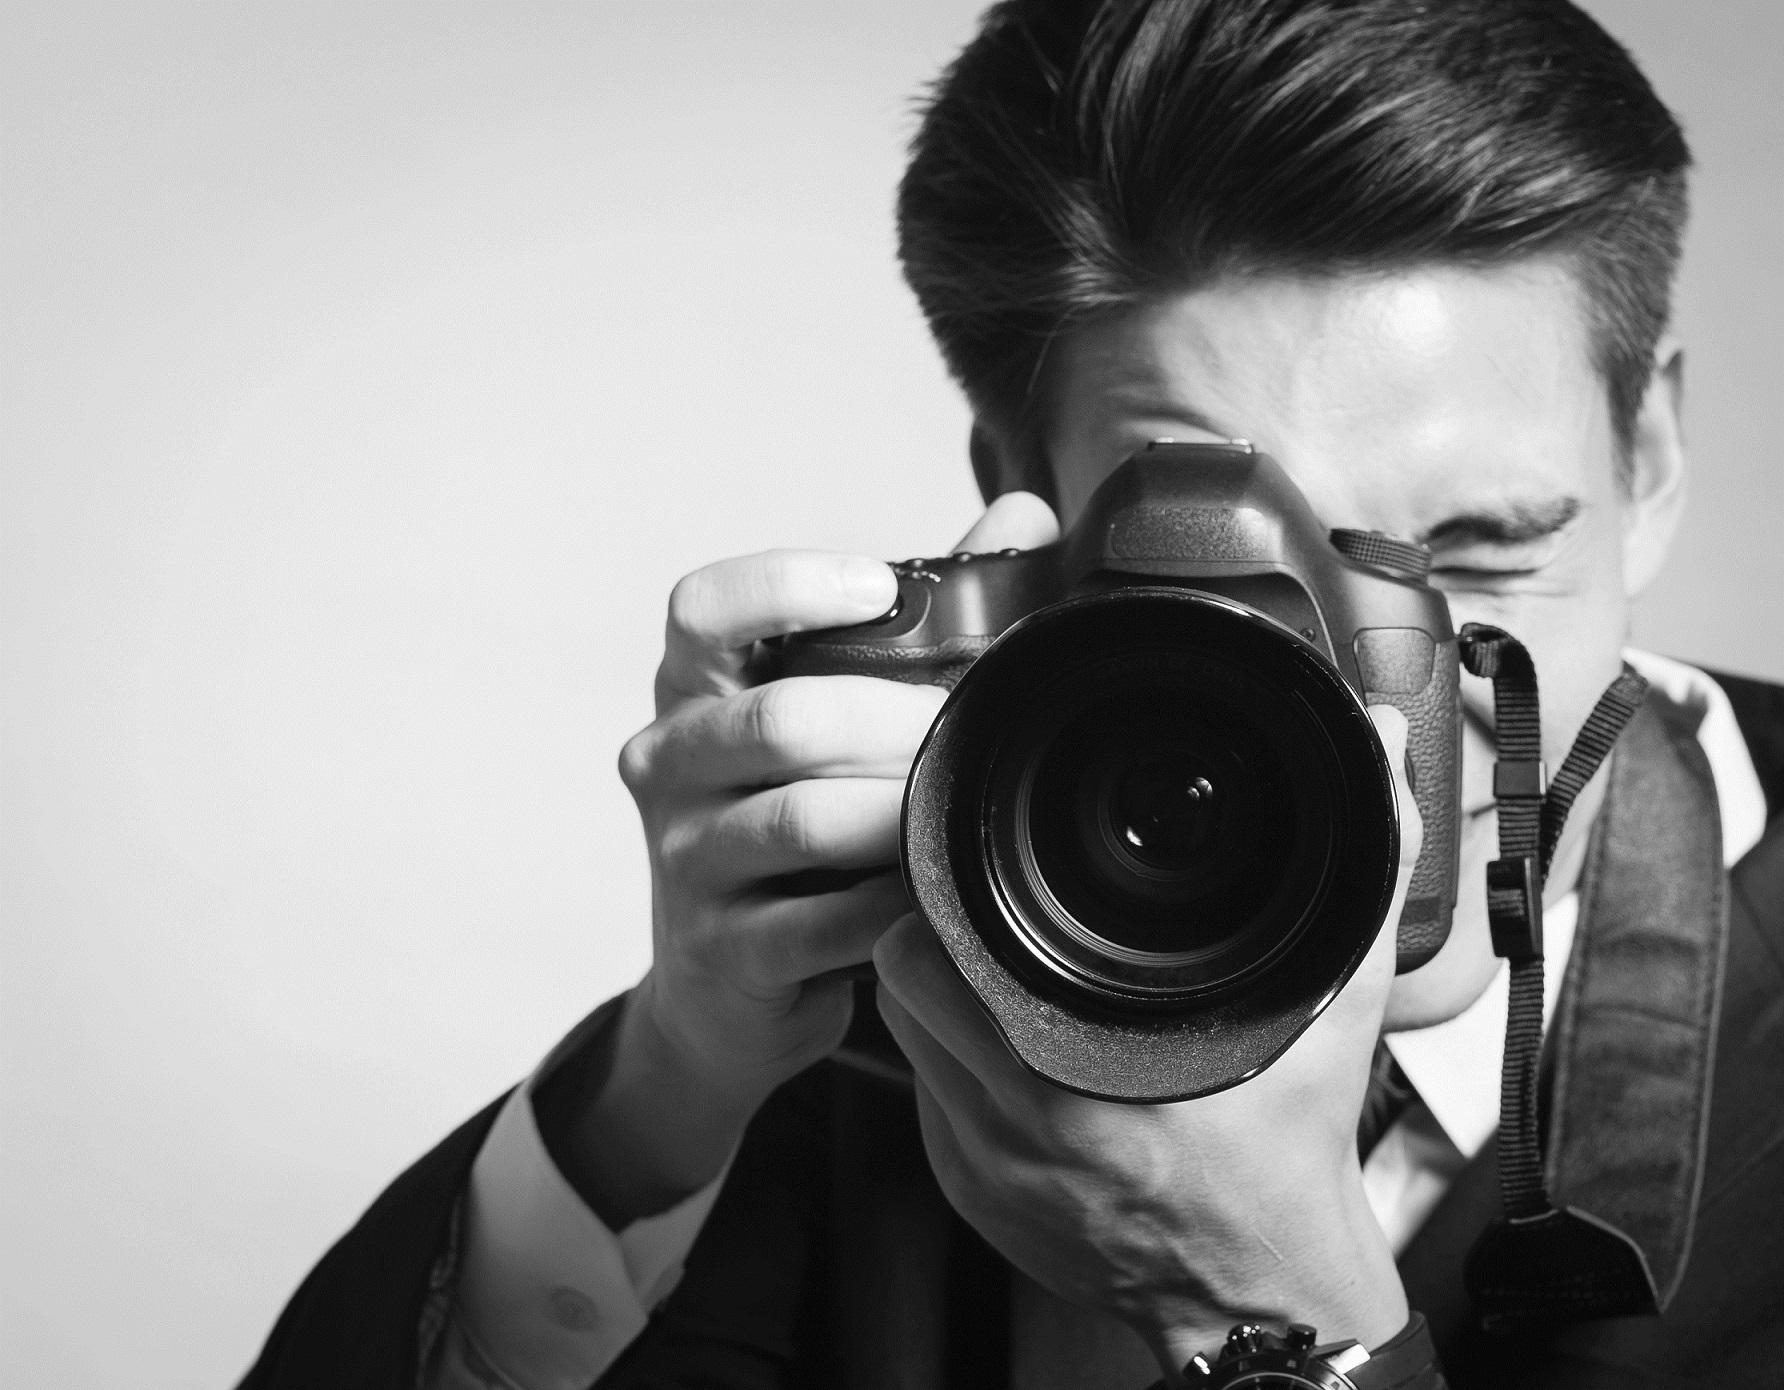 QPT Photographer